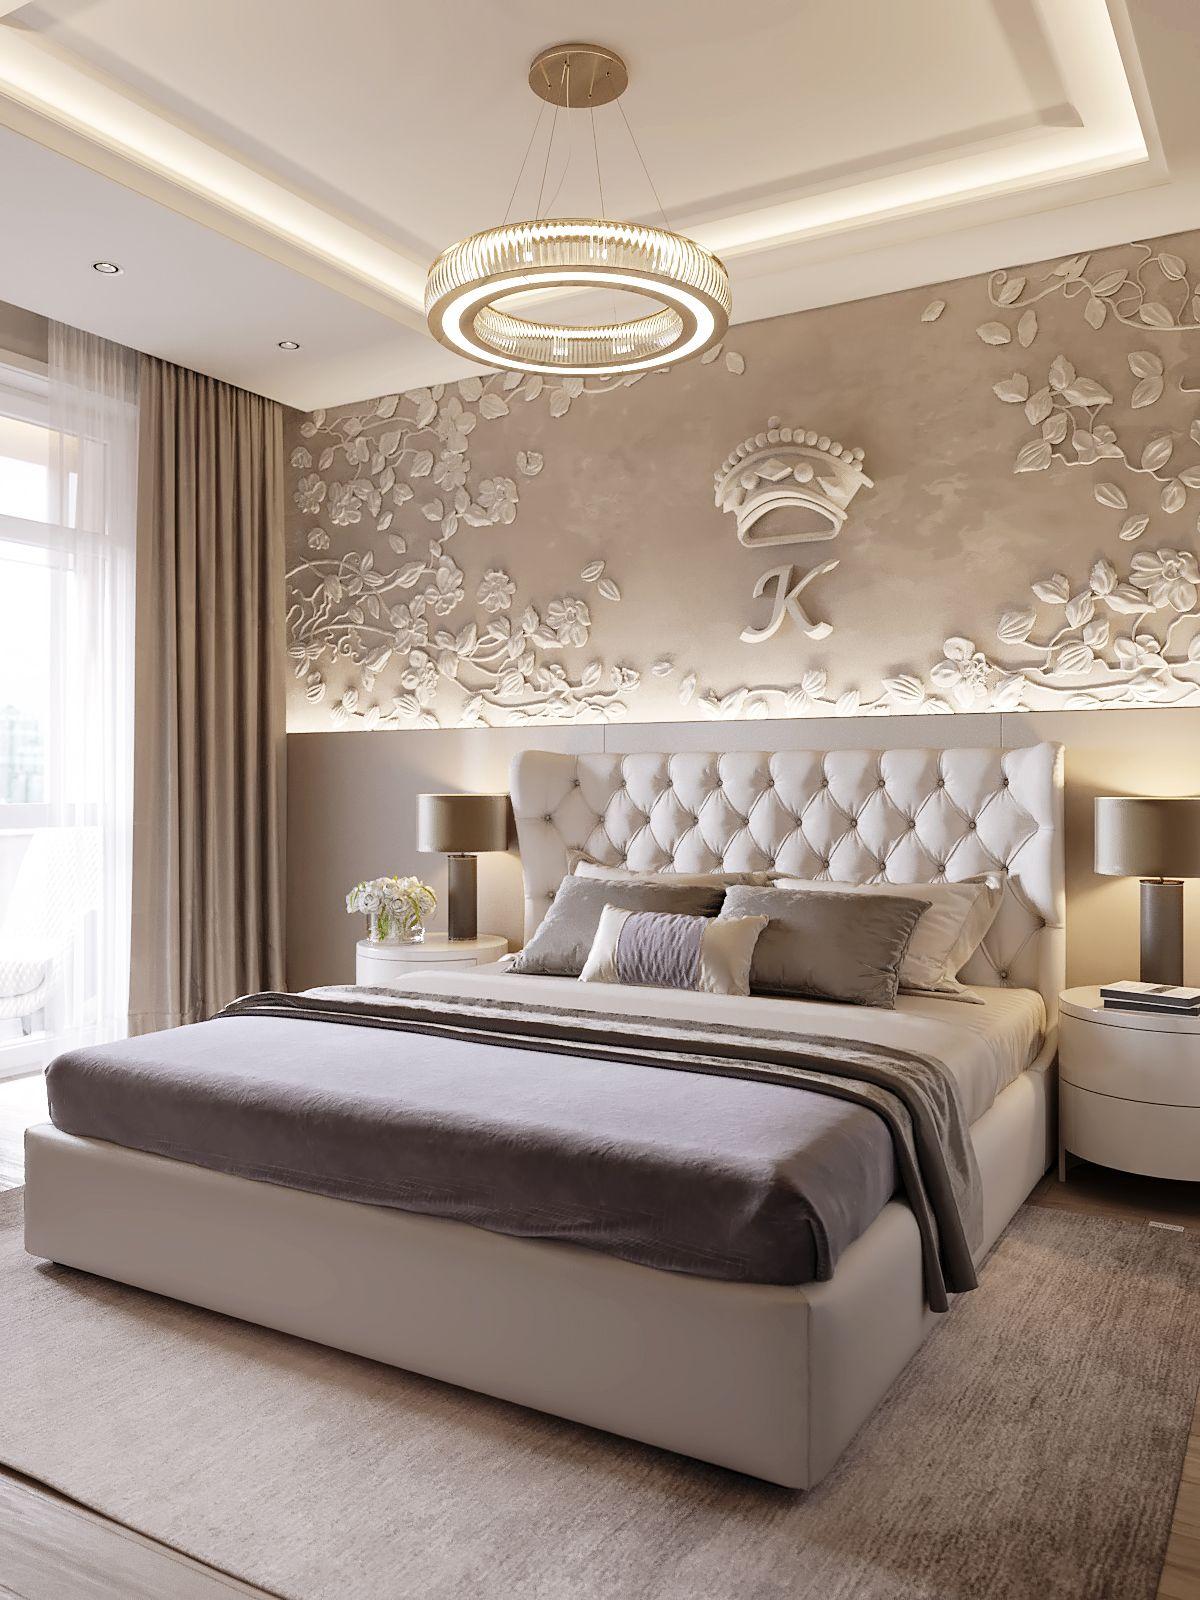 Best Caramel Dreams Apartment In Kiev On Behance Bedroom In 400 x 300